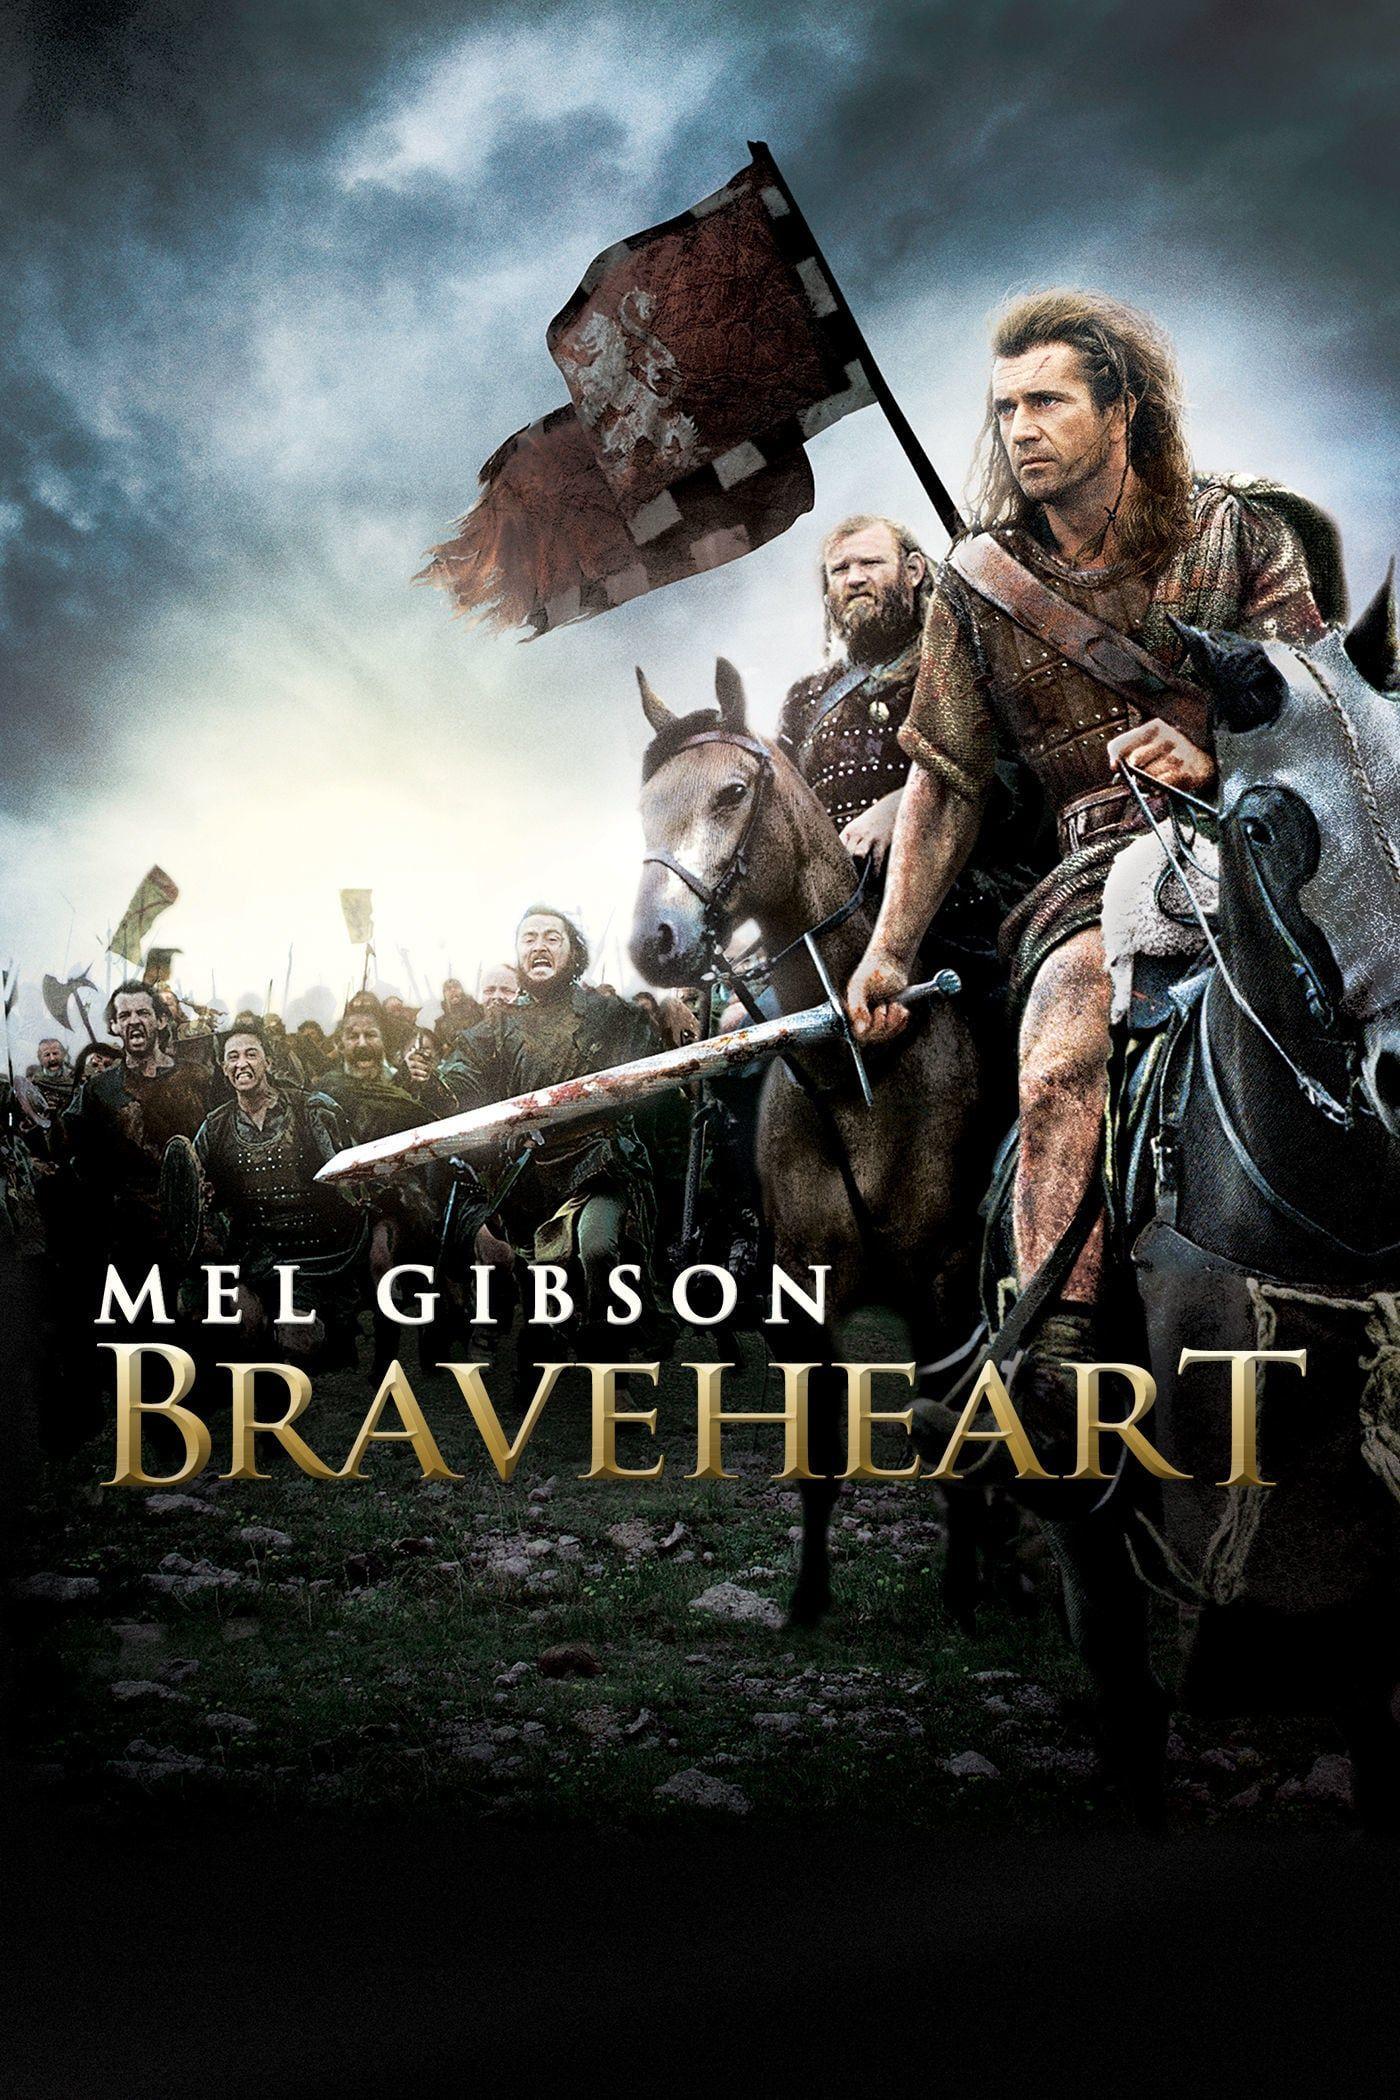 Braveheart 1995 full movie hd quality enjoy full movie